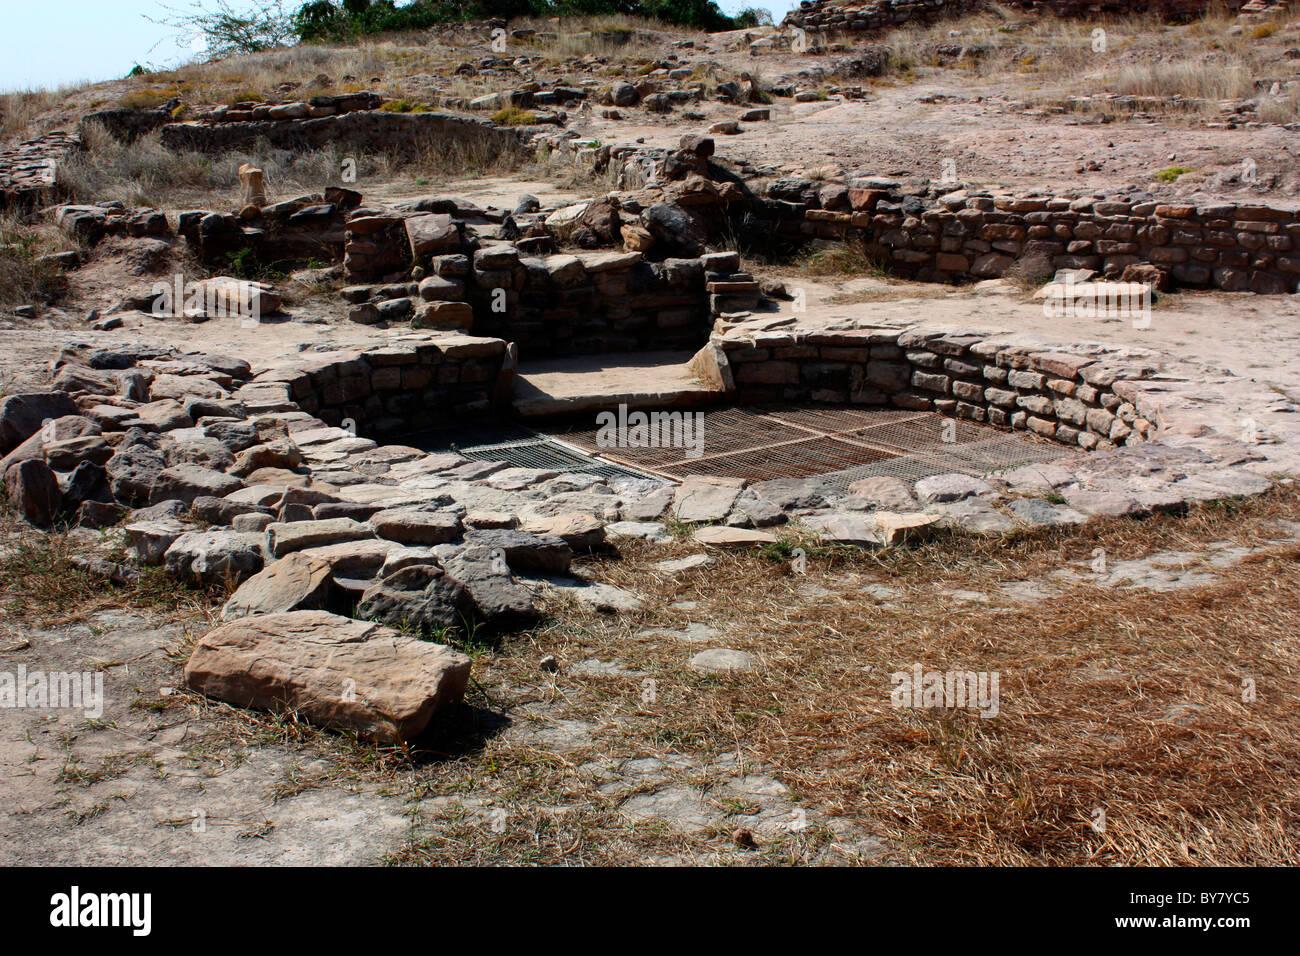 Excavated ruins of Harrappa civilisation at Dholavira, anicient site of Indus valley civilisation, Kutch,Gujarat, - Stock Image